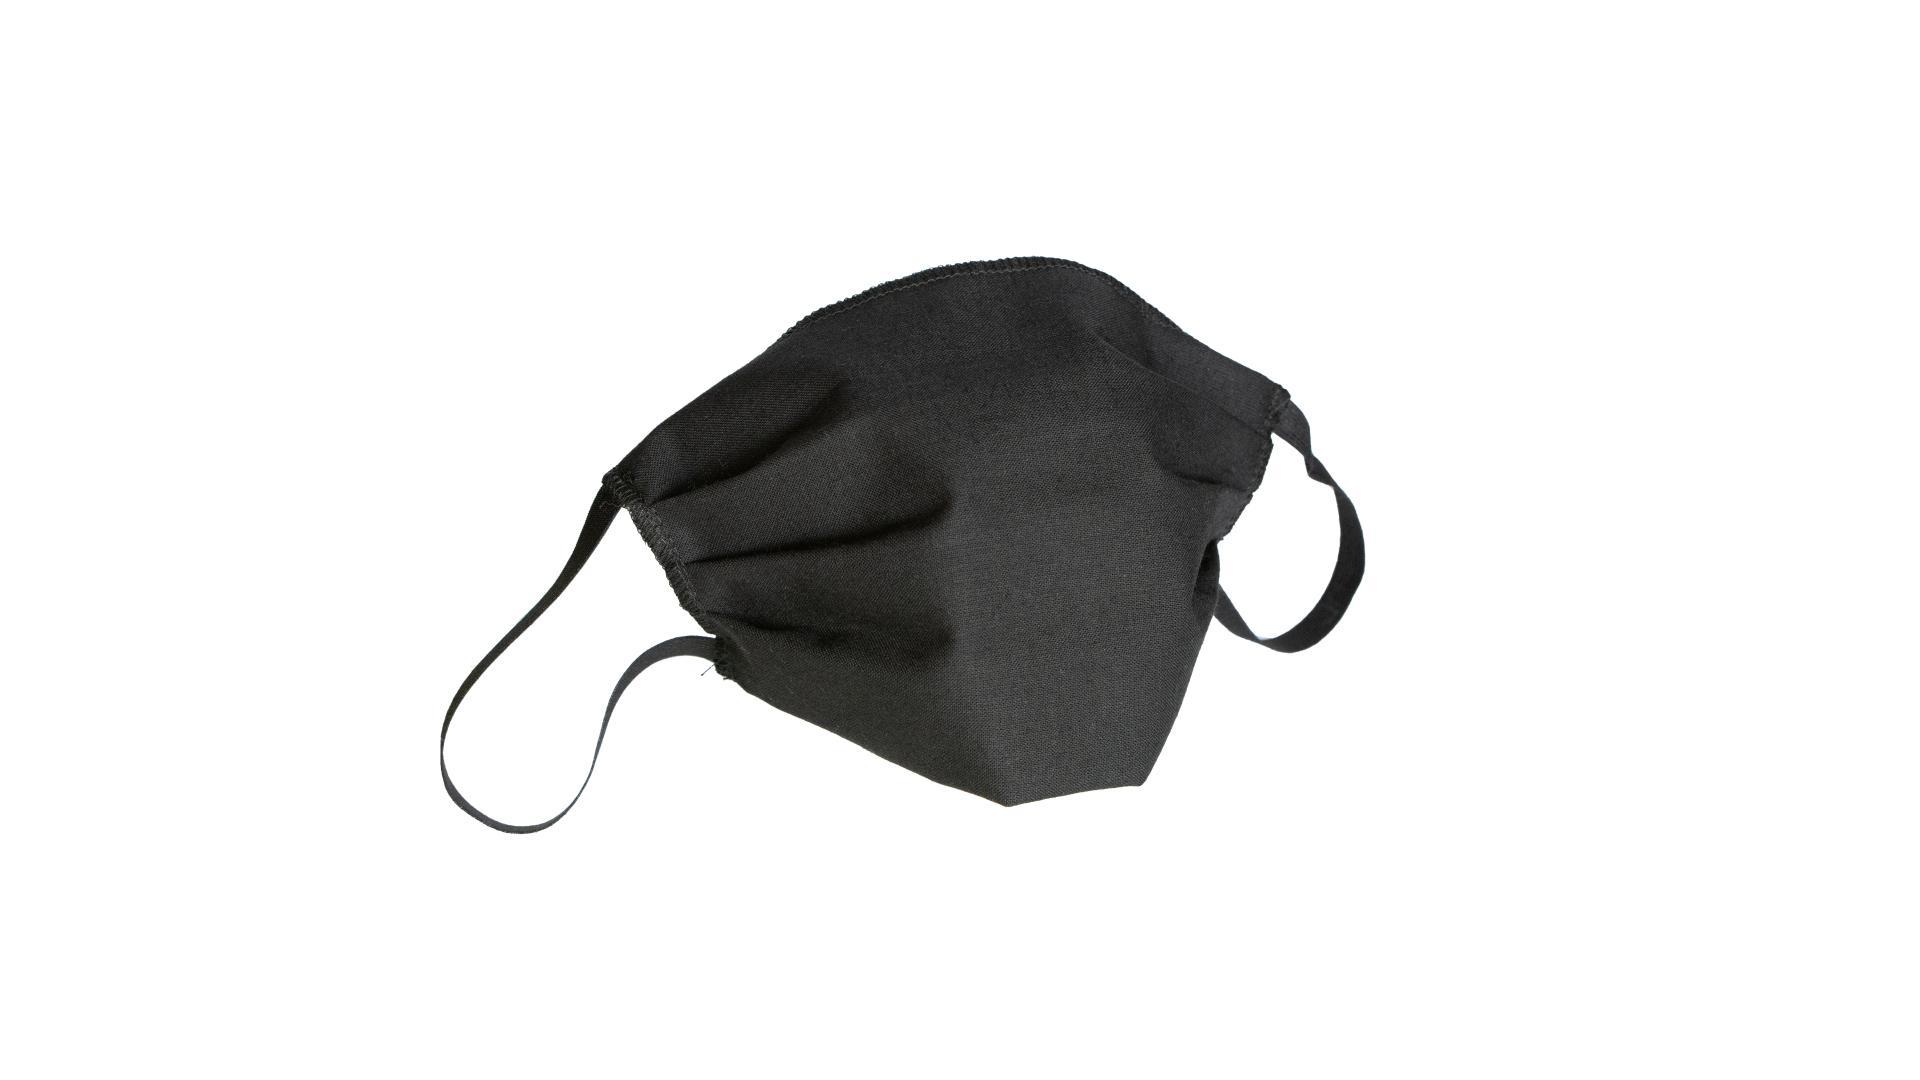 4CARS Dvouvrstvé ochranné bavlněné rouško černé bez vzoru s gumičkou 3ks